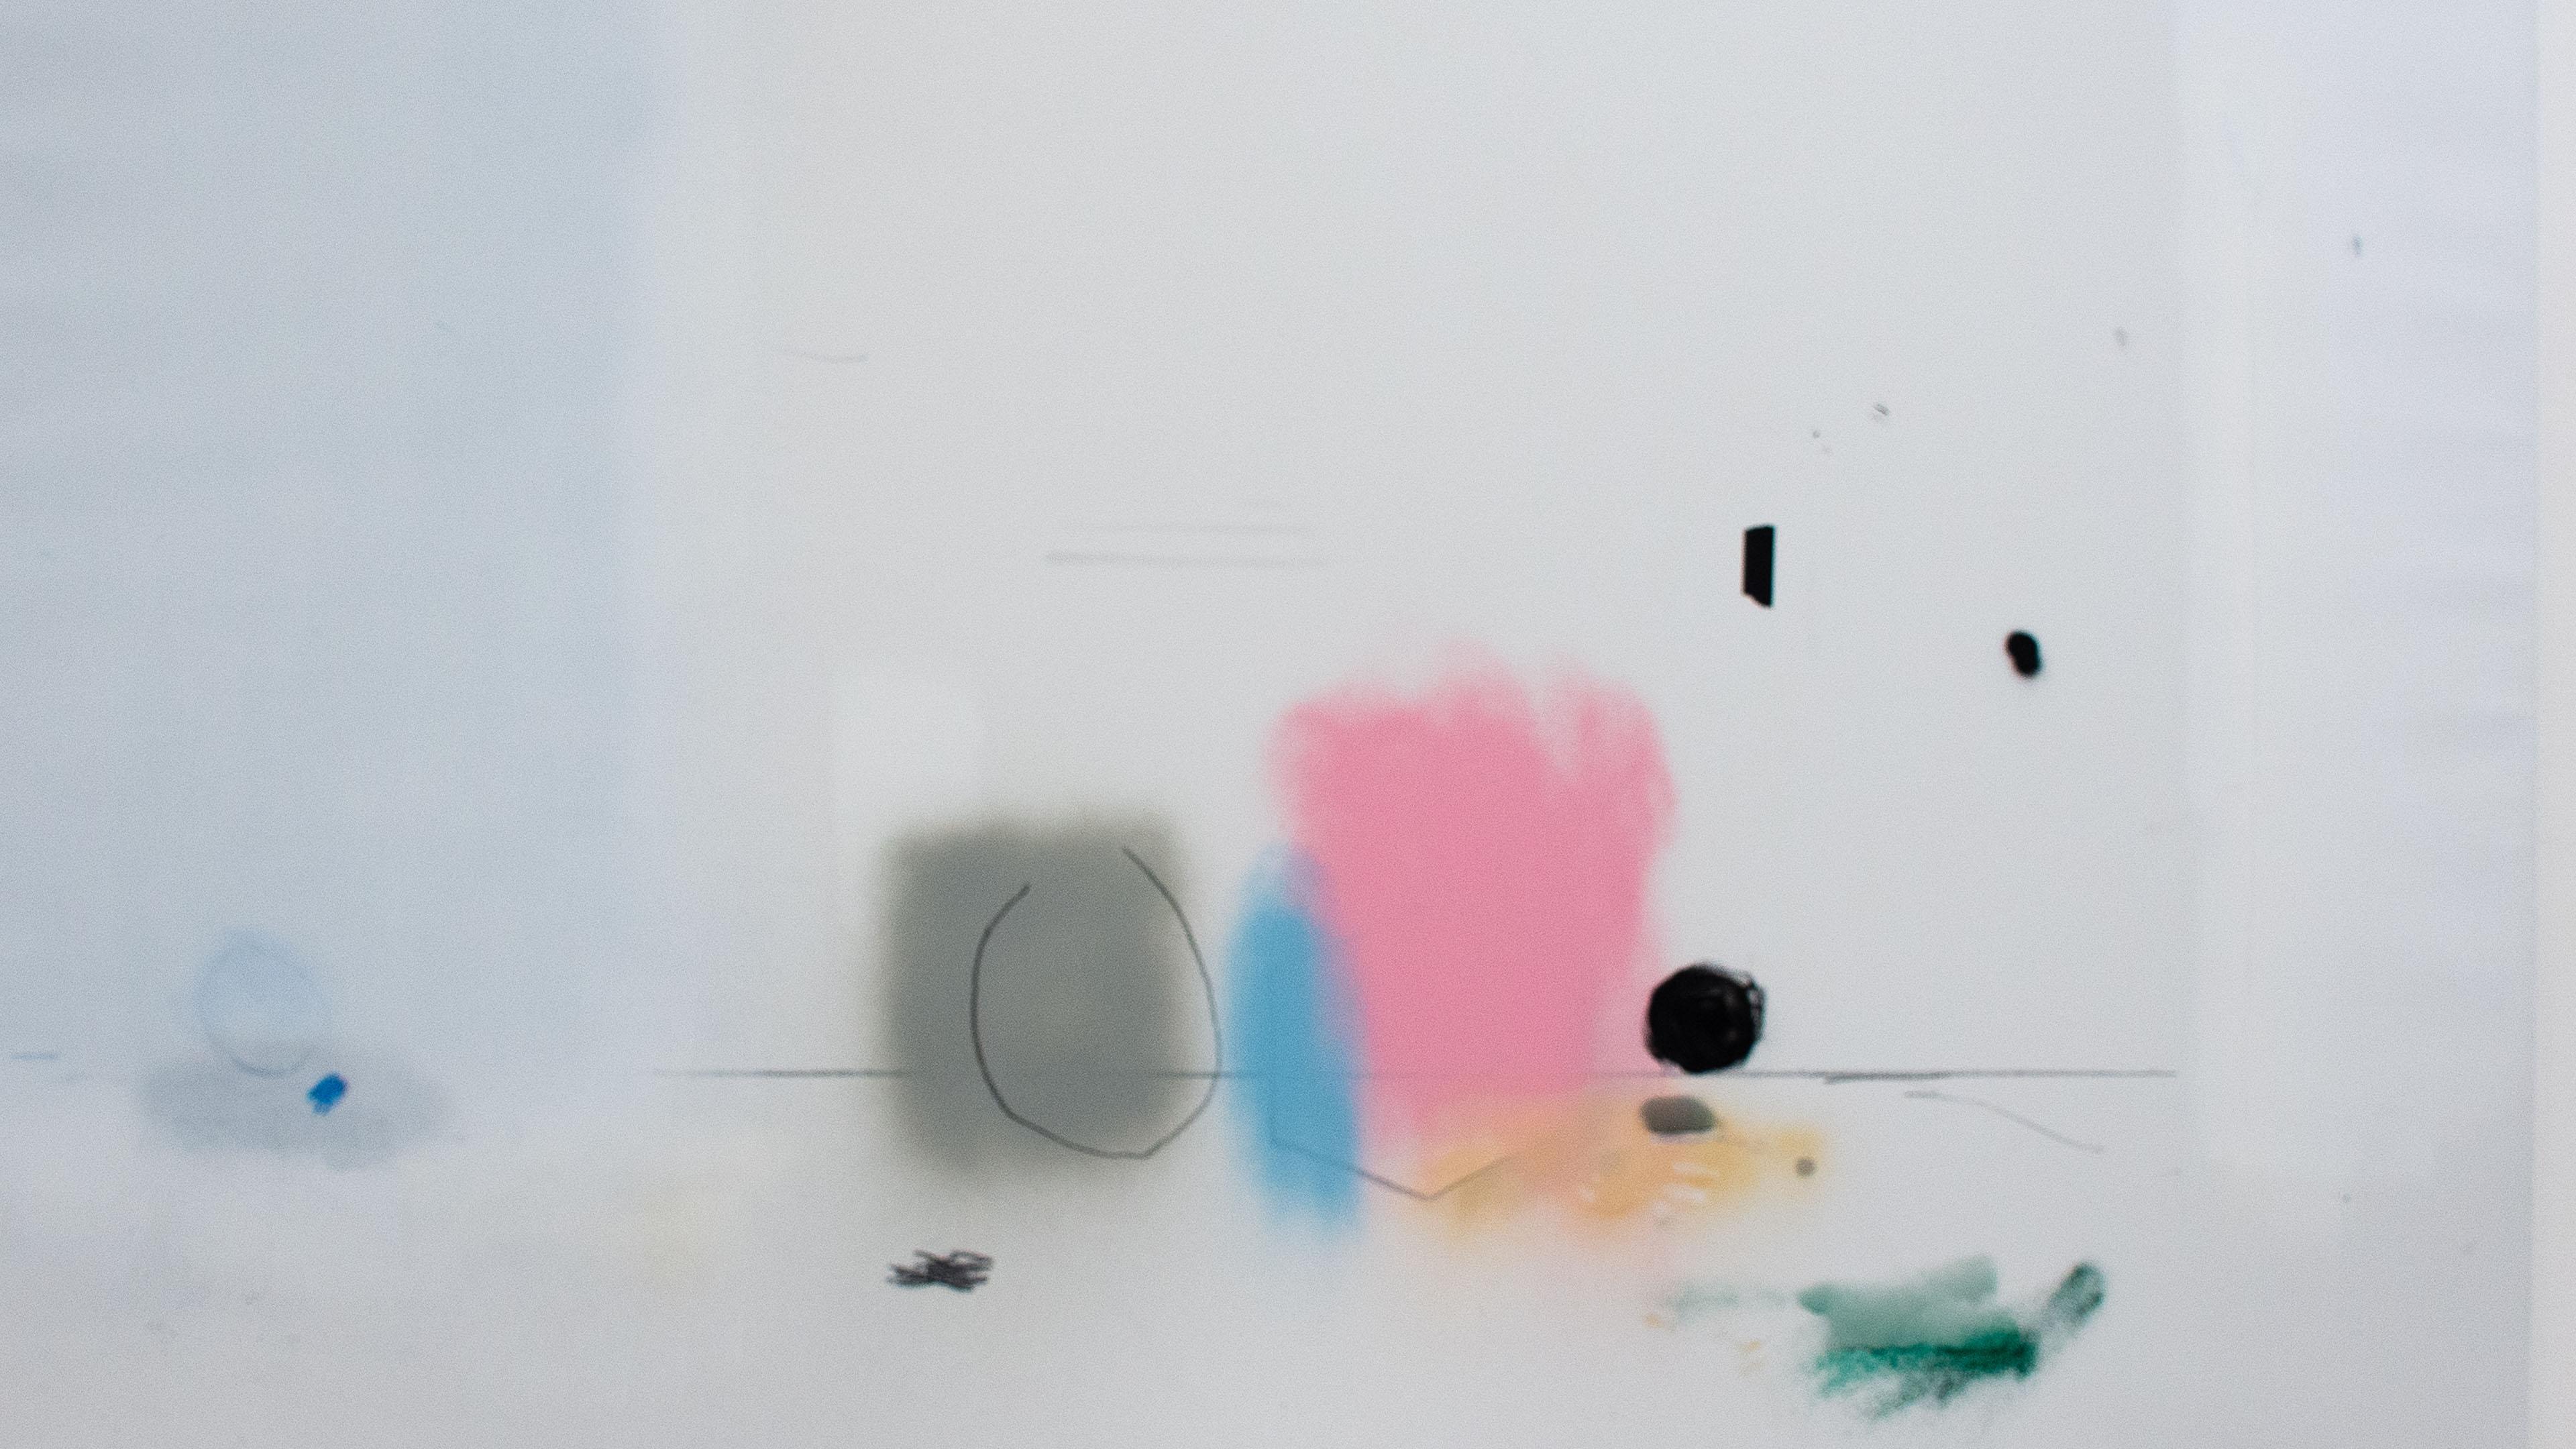 Pintura sobre fondo blanco.